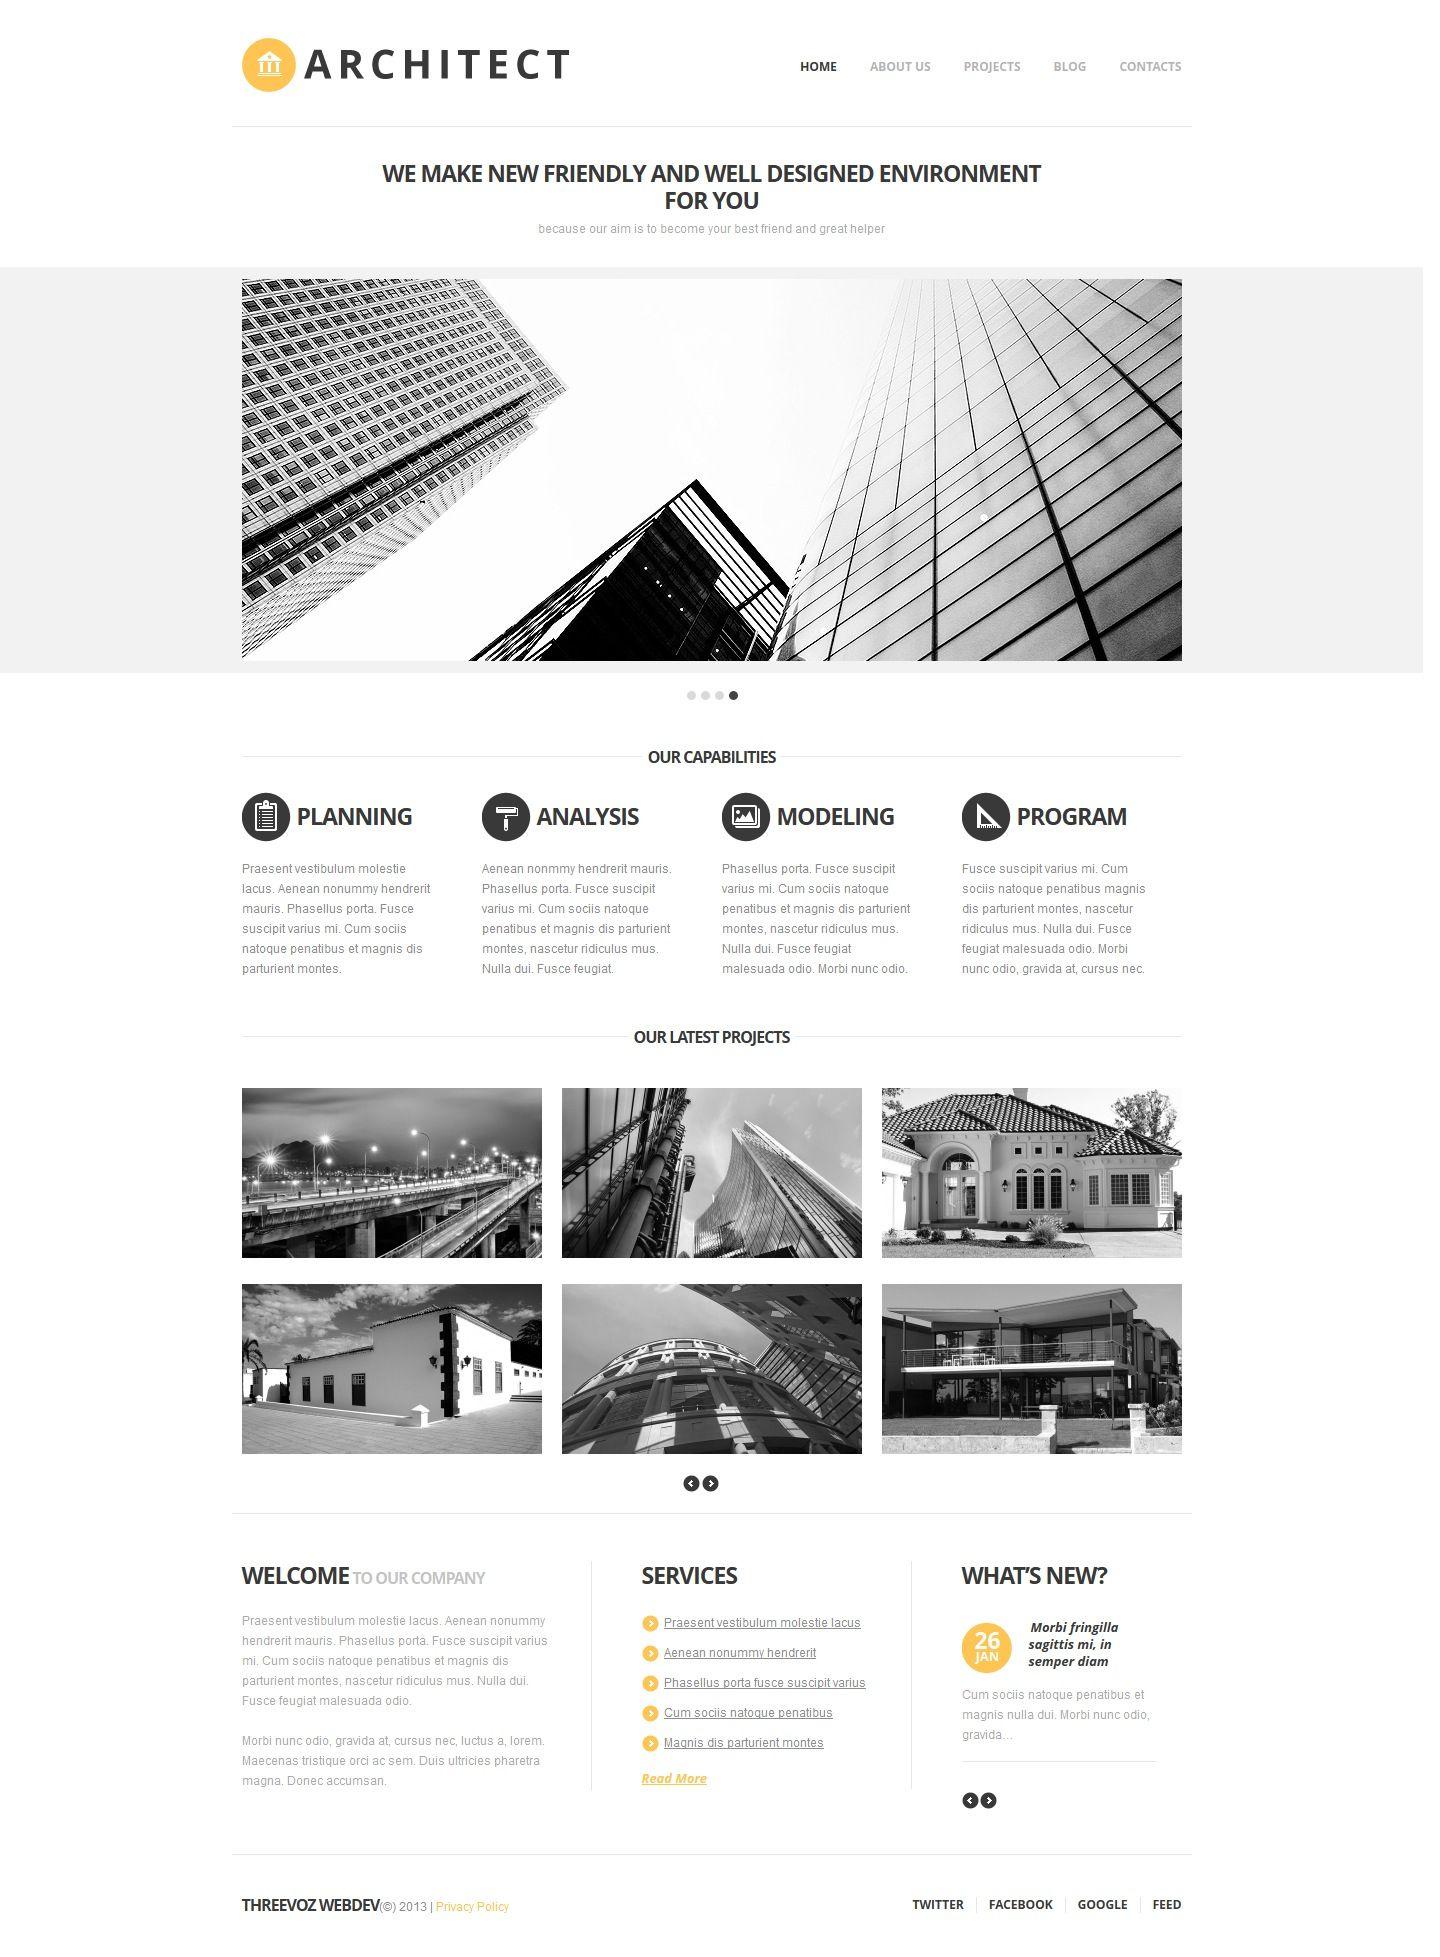 Company Profile Website Template Website Company Profile Template Architect Building Wellness Design Company Profile Design Website Inspiration